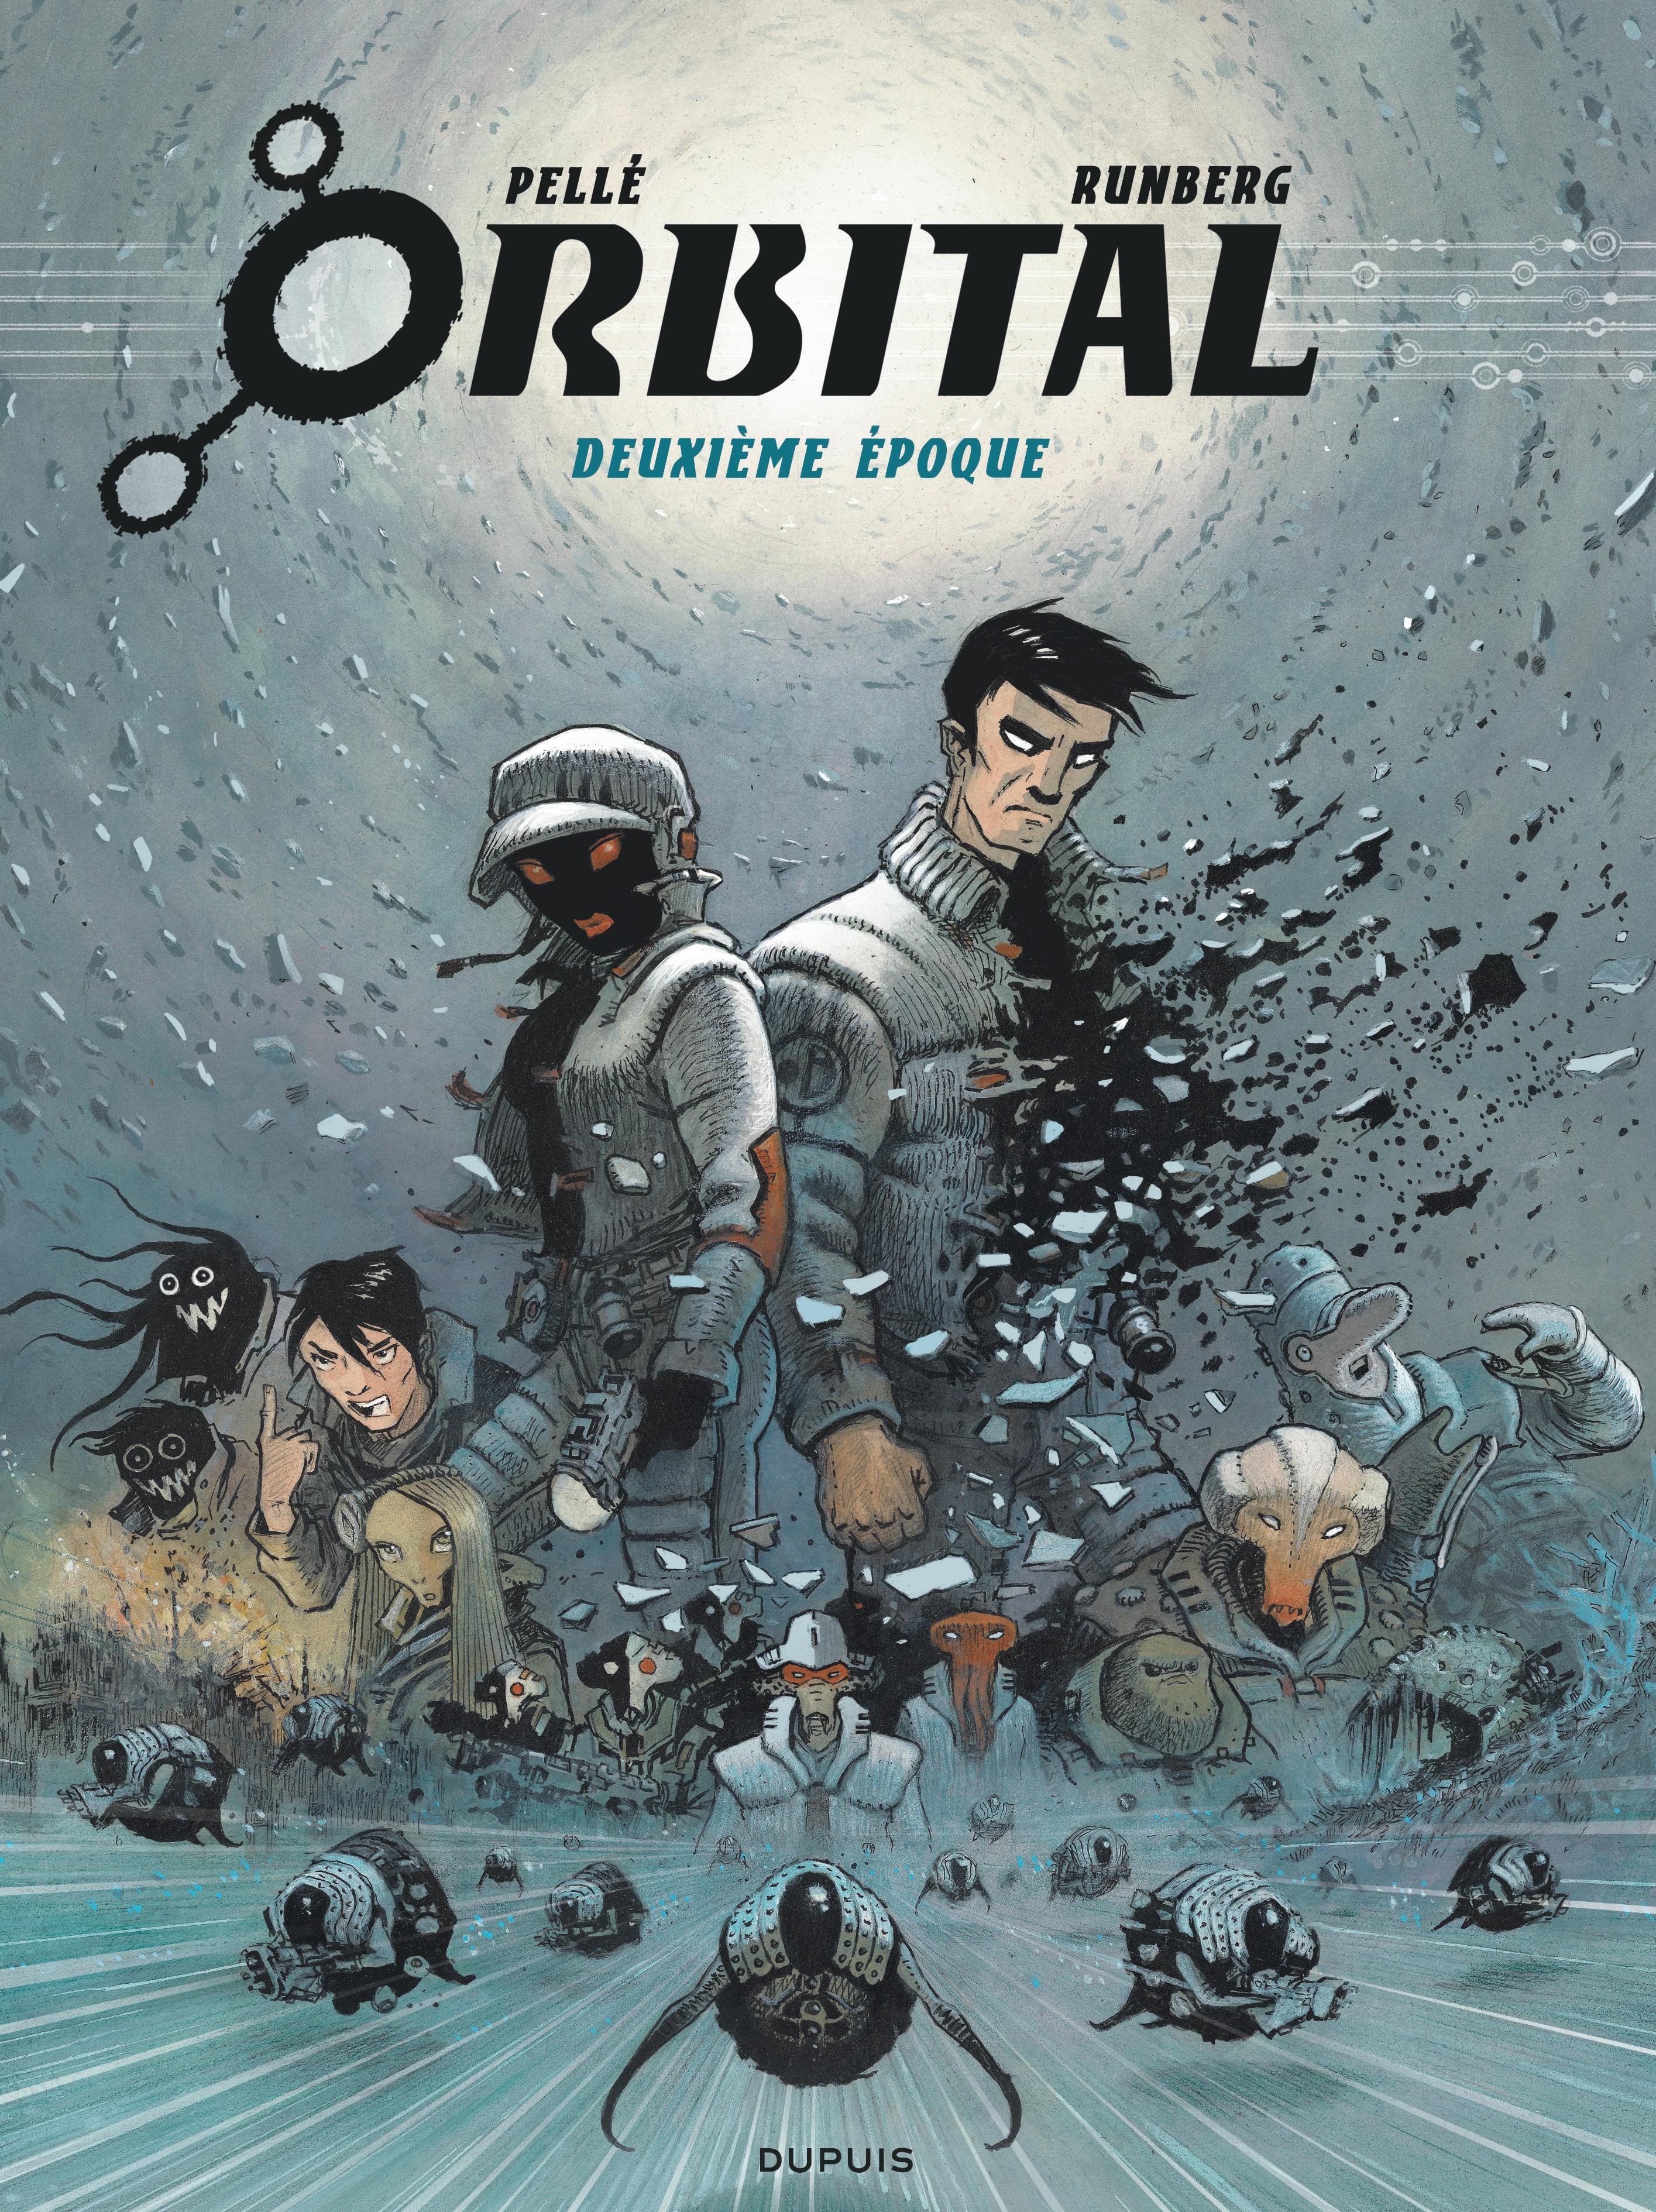 ORBITAL - L'INTEGRALE - TOME 2 - DEUXIEME EPOQUE